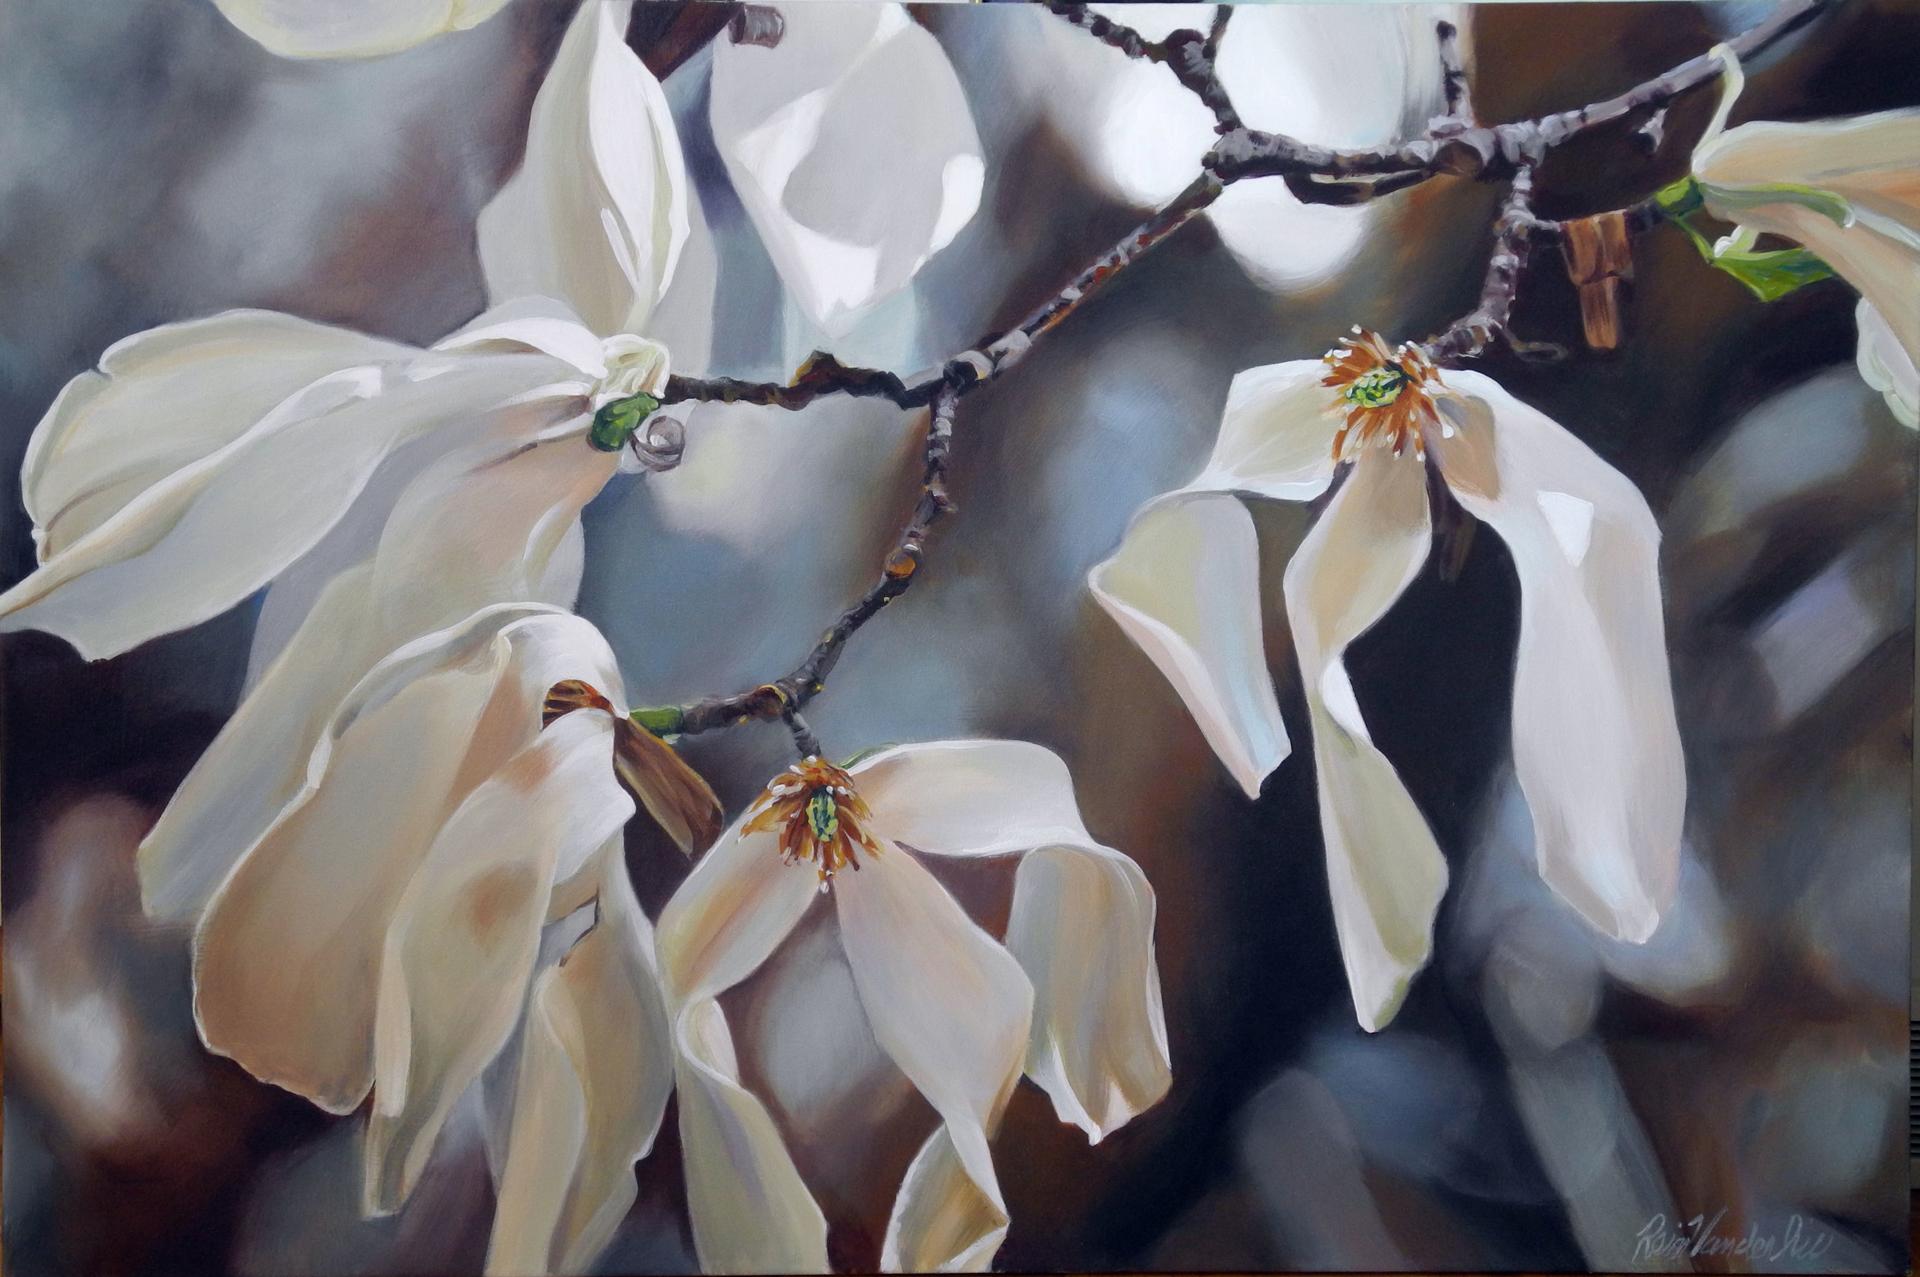 Repose in Soft Light by Rein Vanderhill